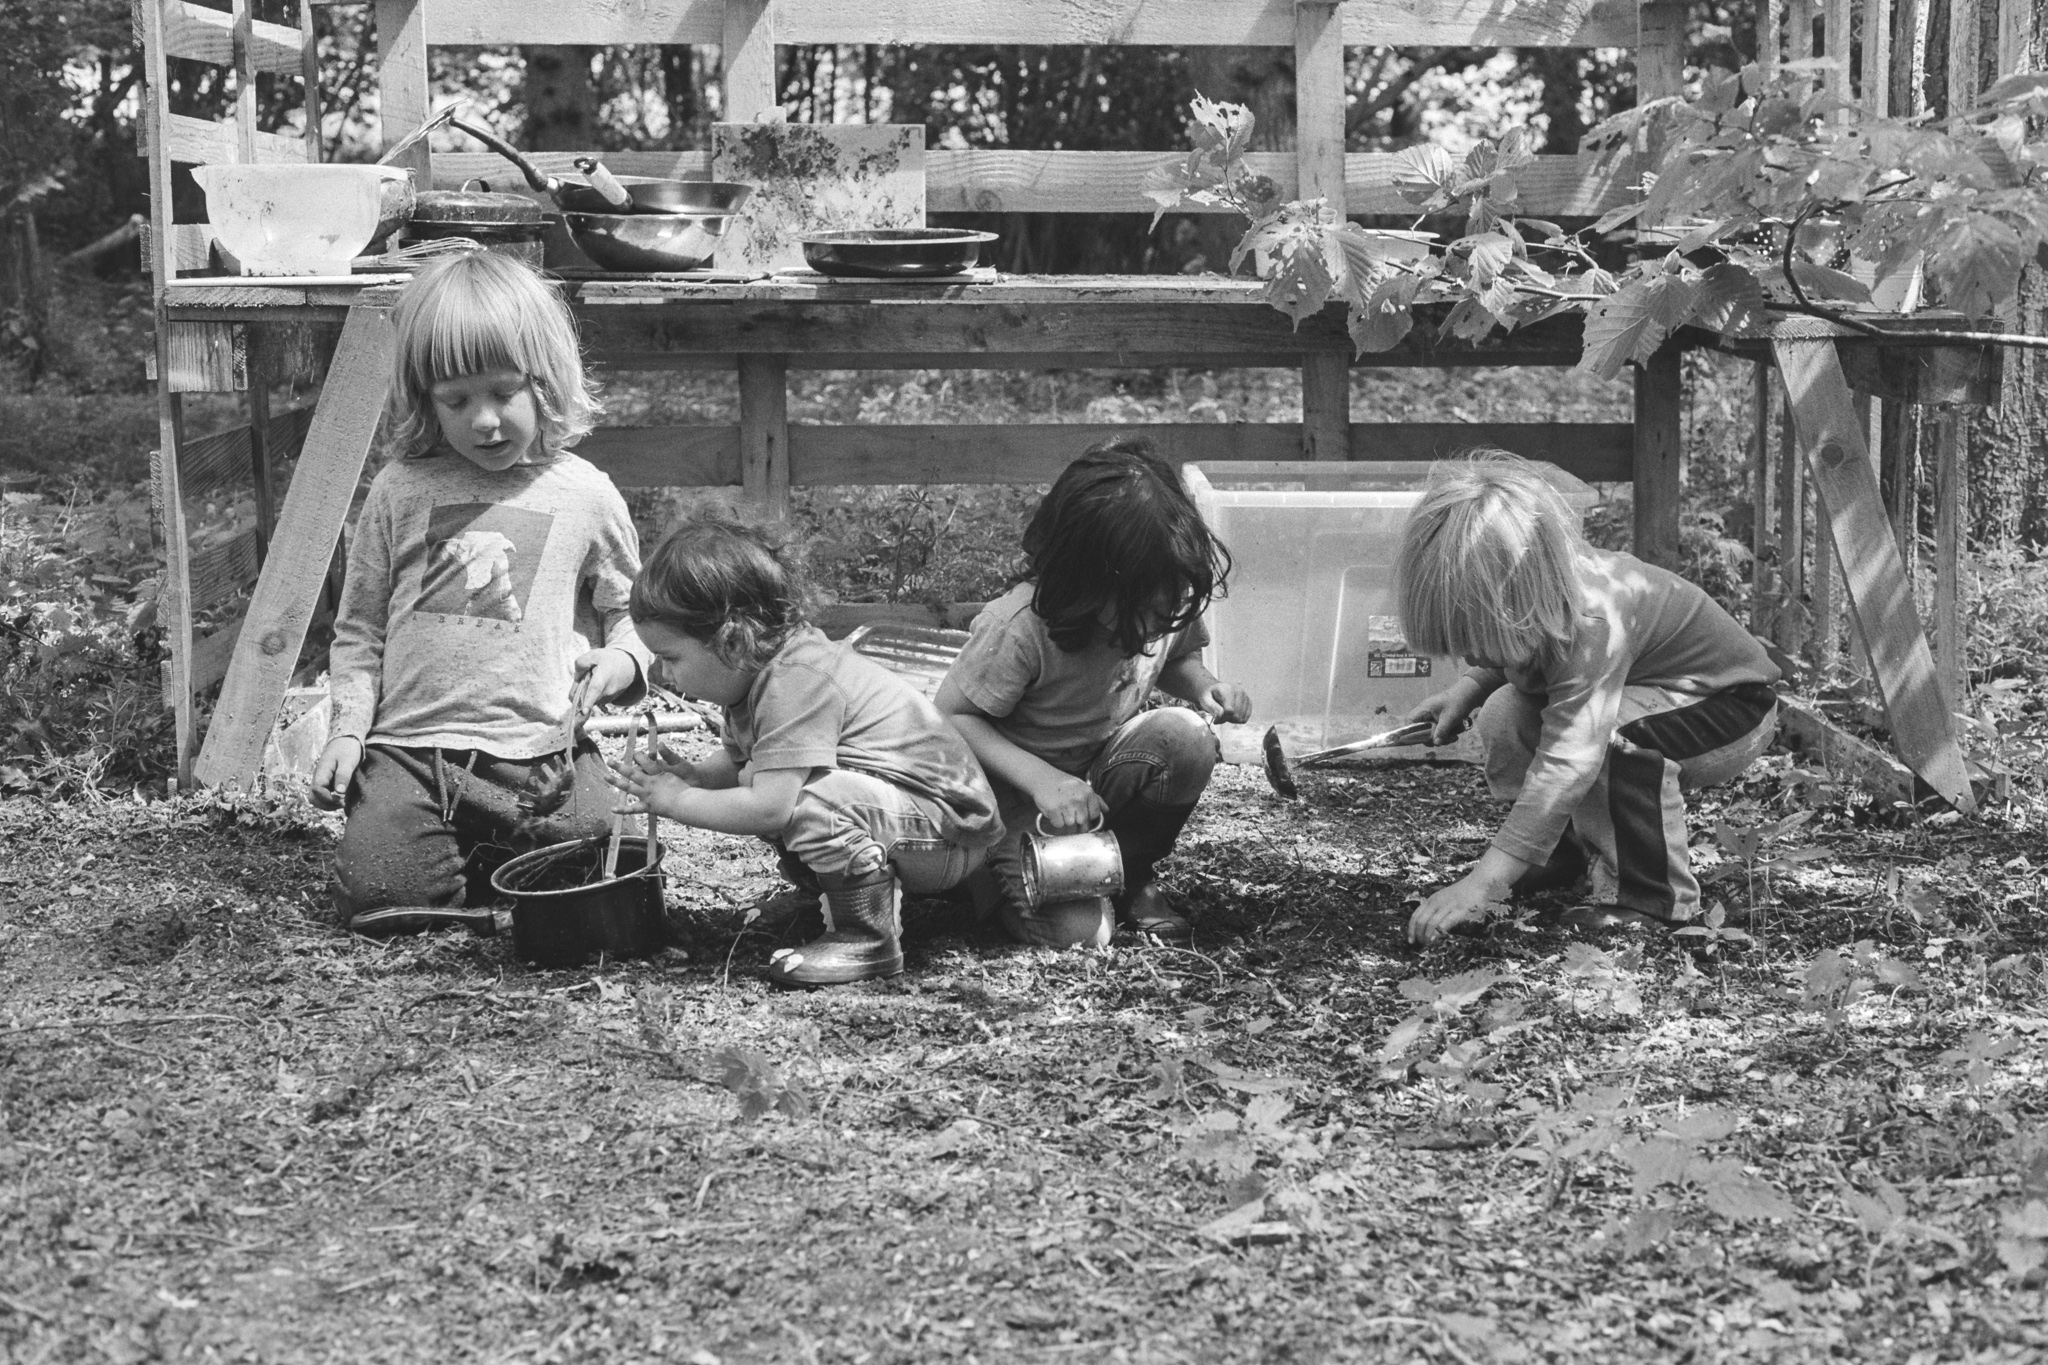 Mud kitchen woodland play - credit Amara Photography